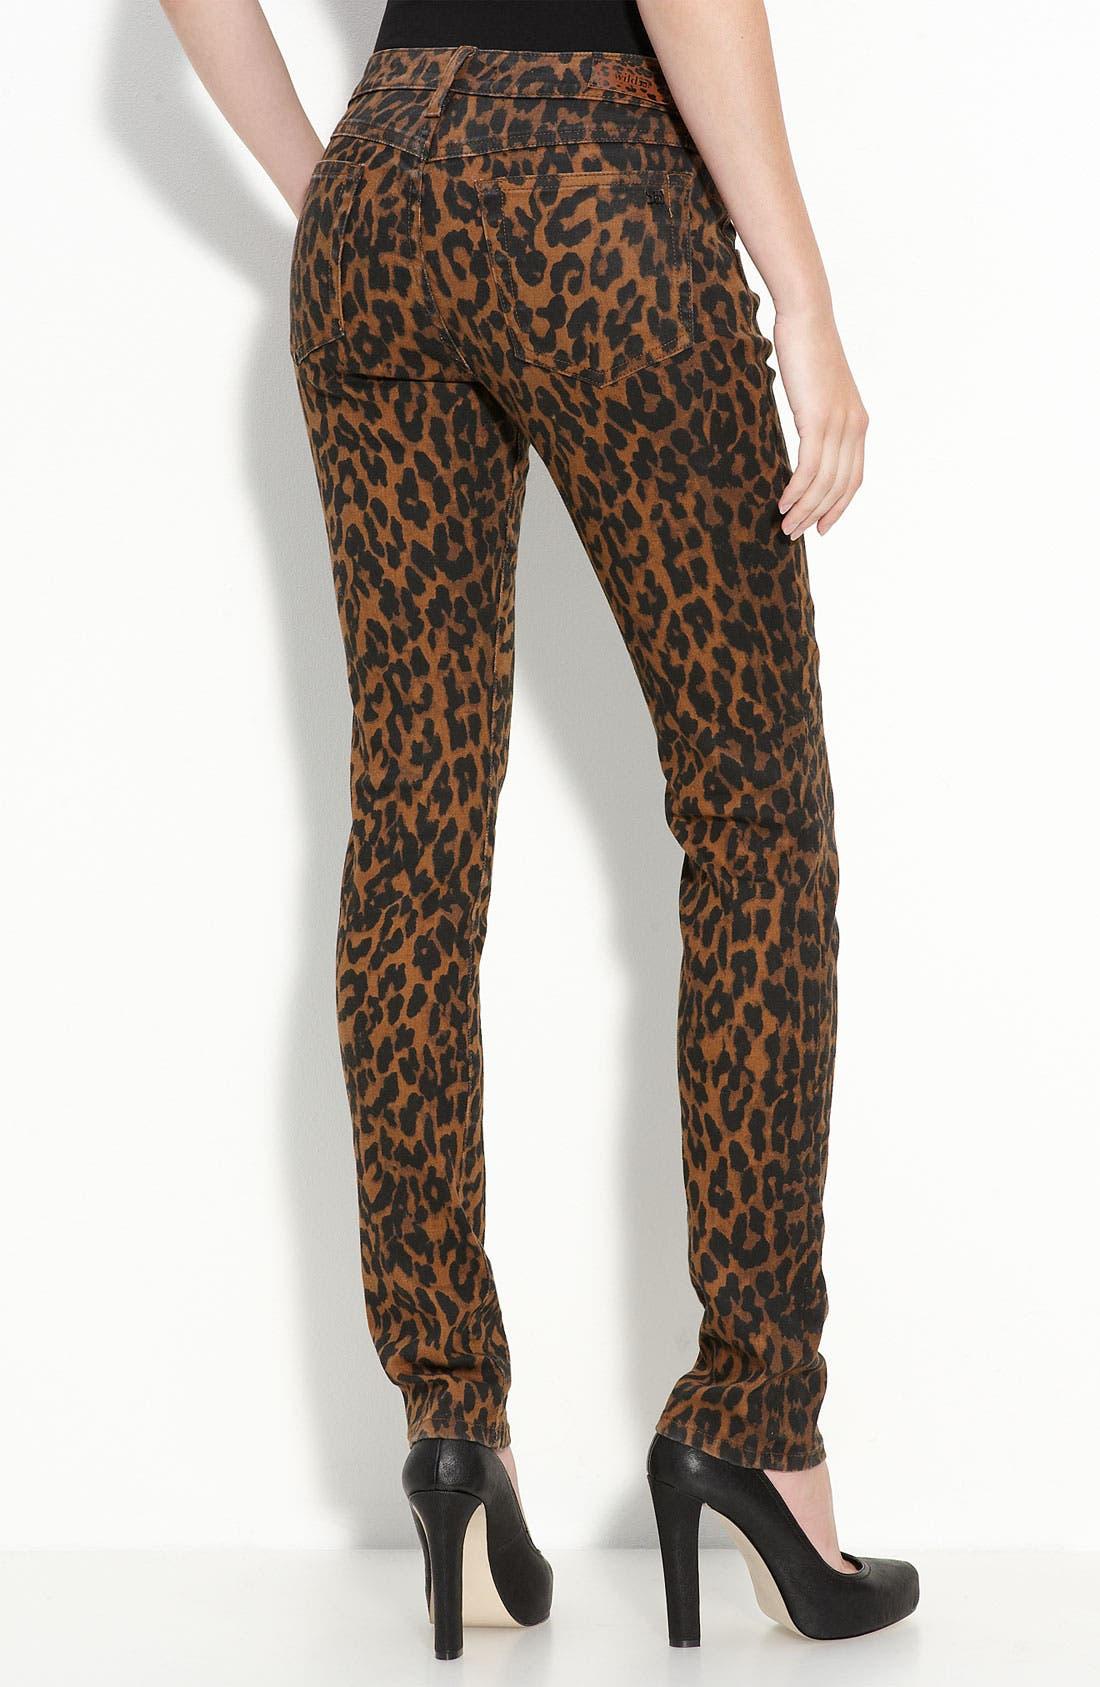 Leopard Print Skinny Stretch Denim Jeans,                             Main thumbnail 1, color,                             200